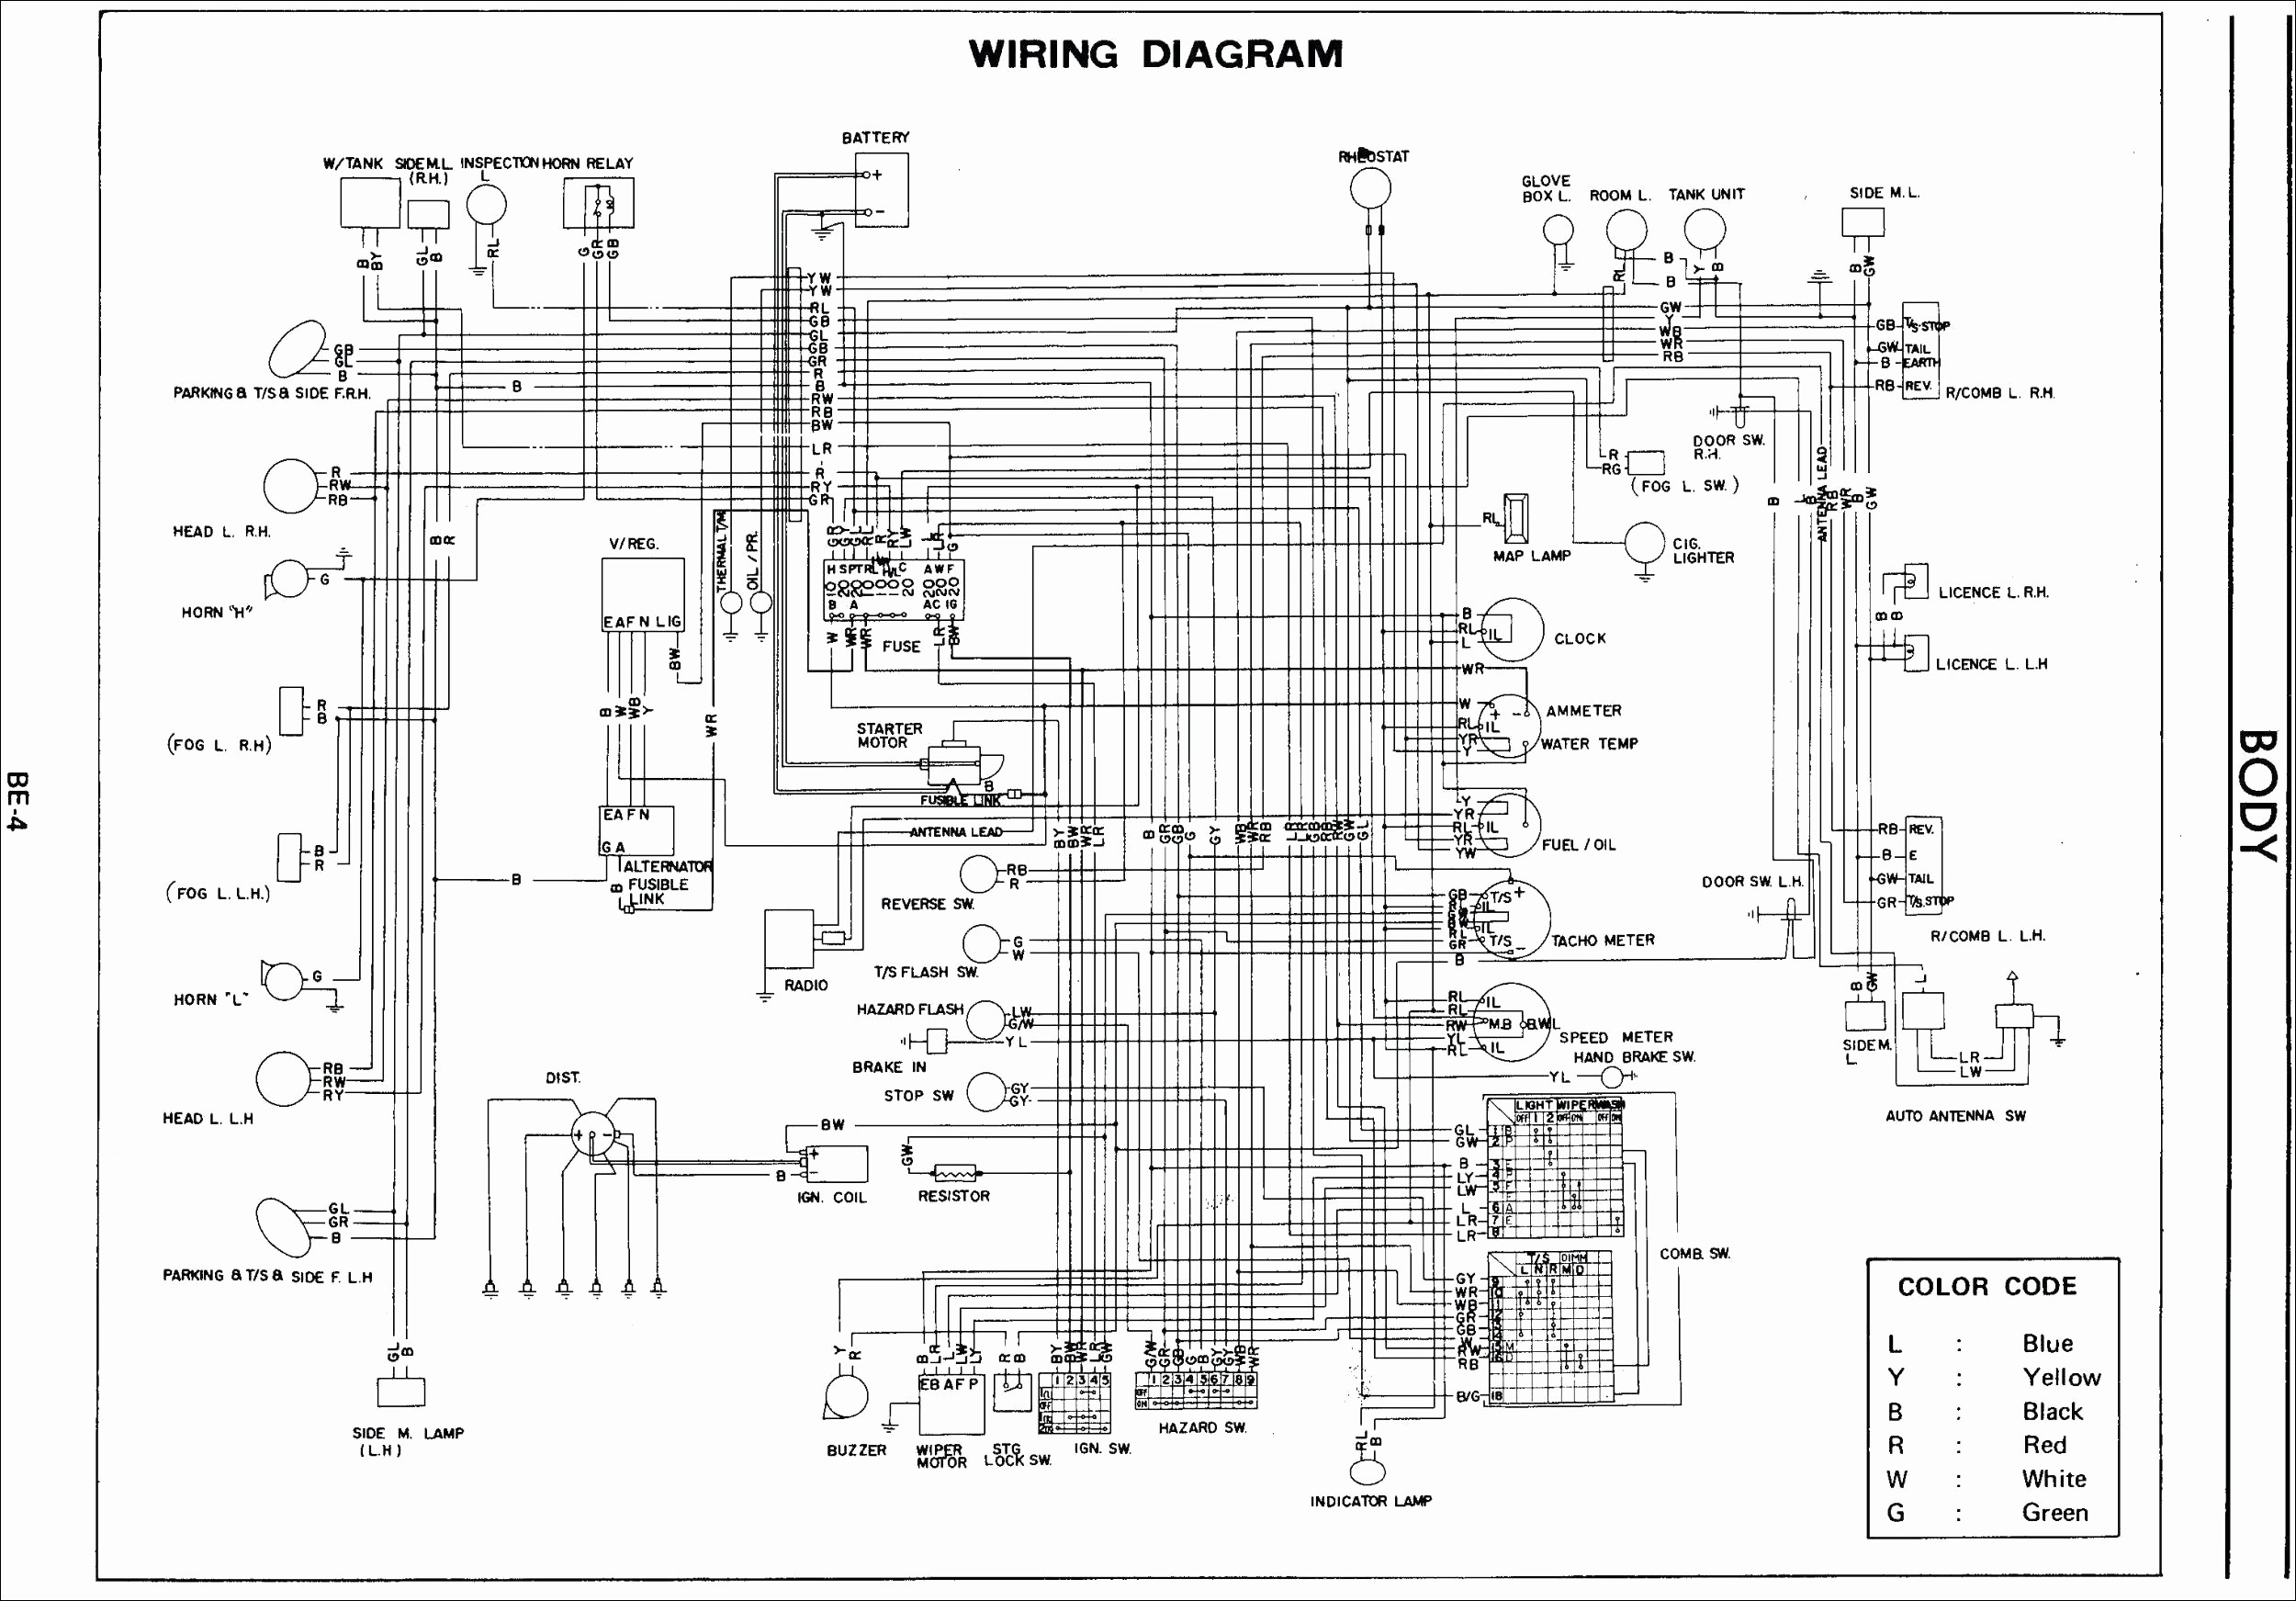 2002 Nissan Sentra Engine Diagram 2000 Nissan Altima Radio ... on